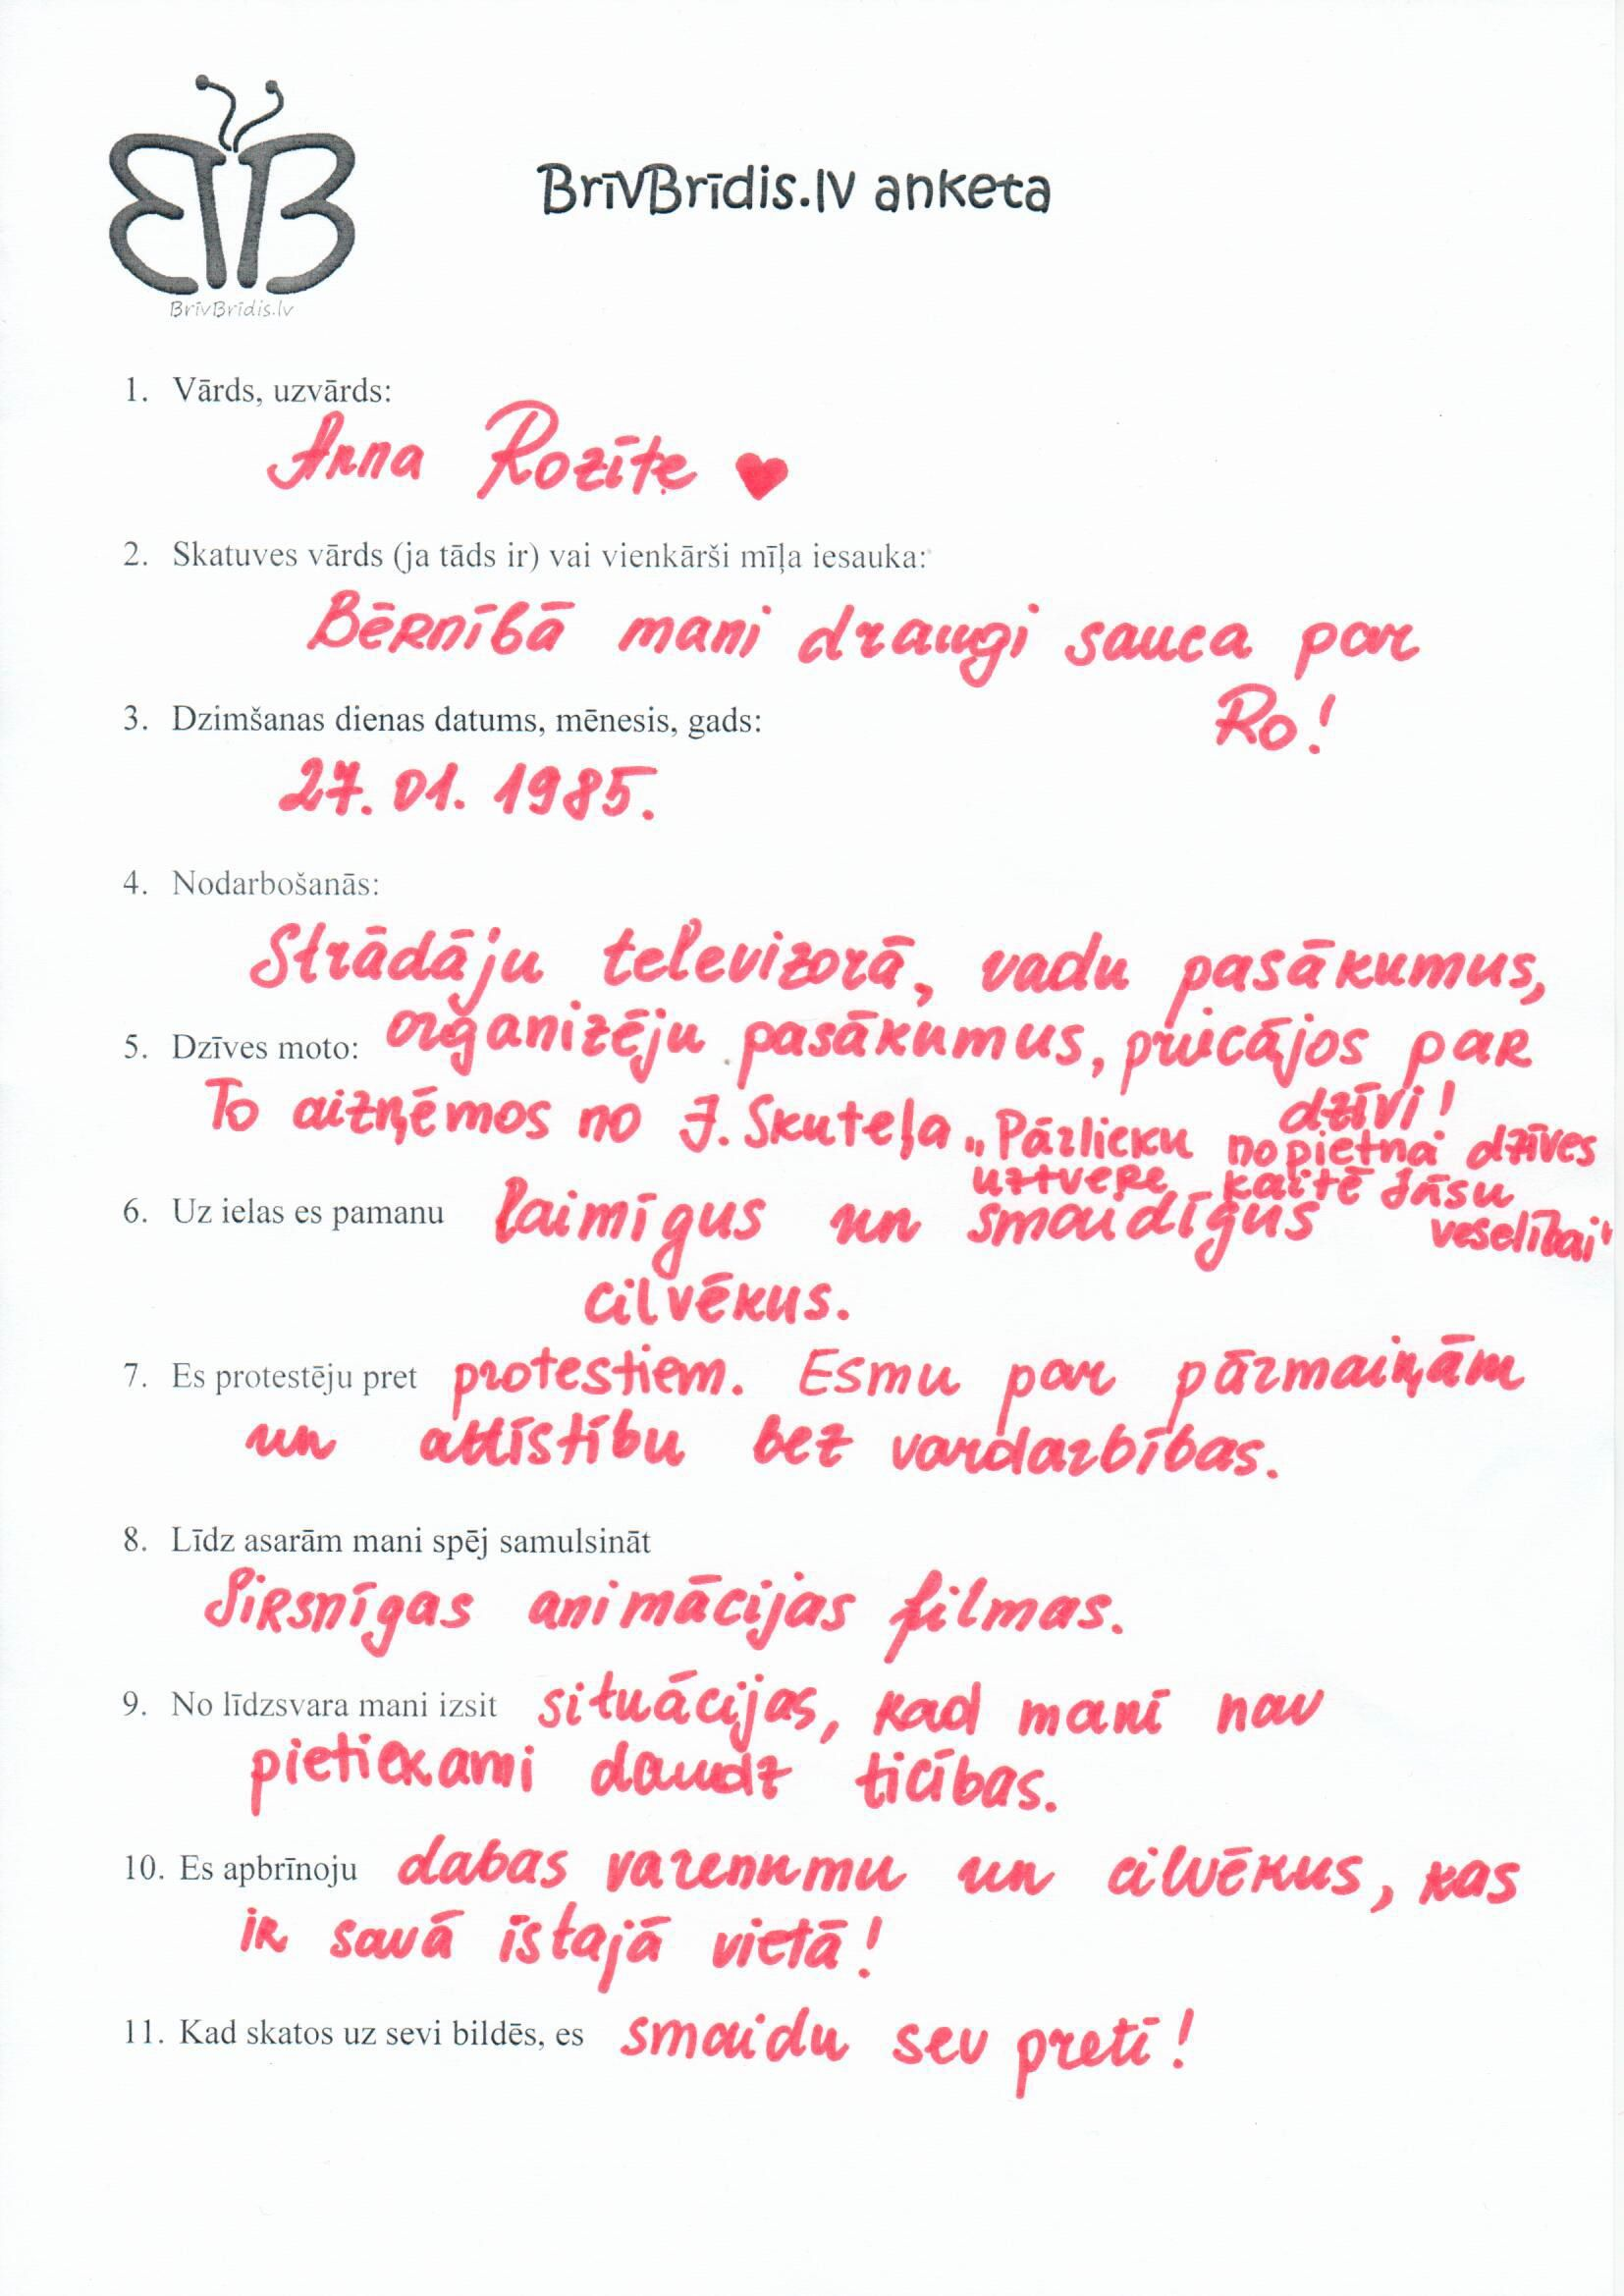 Anketa_1dalja